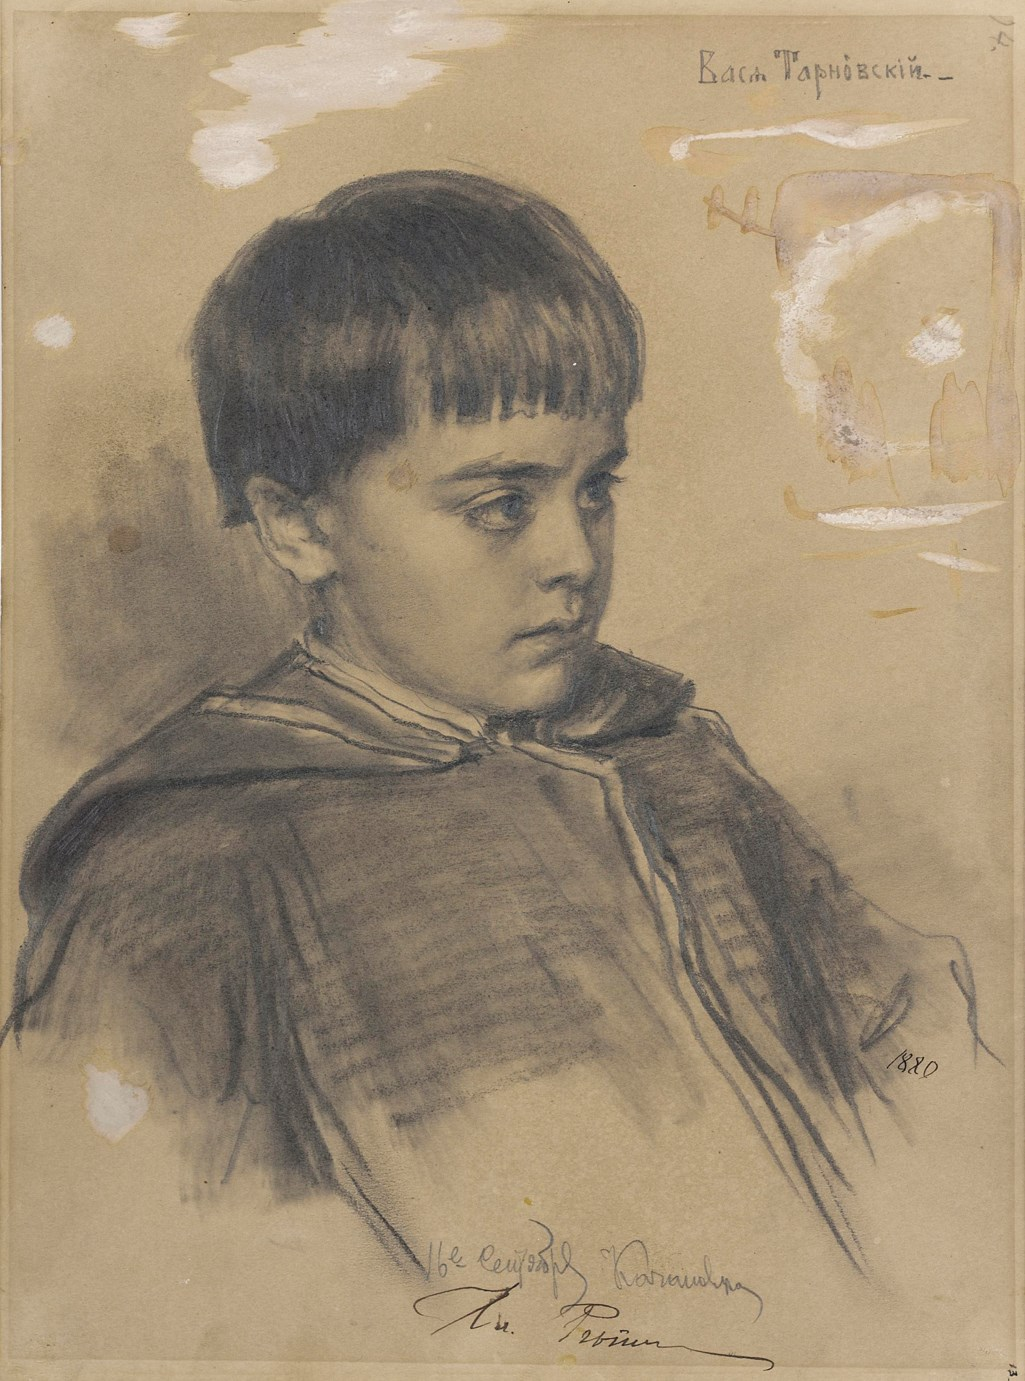 Ilya Repin (1844-1930) Portrait of Vasia Tarnovskii